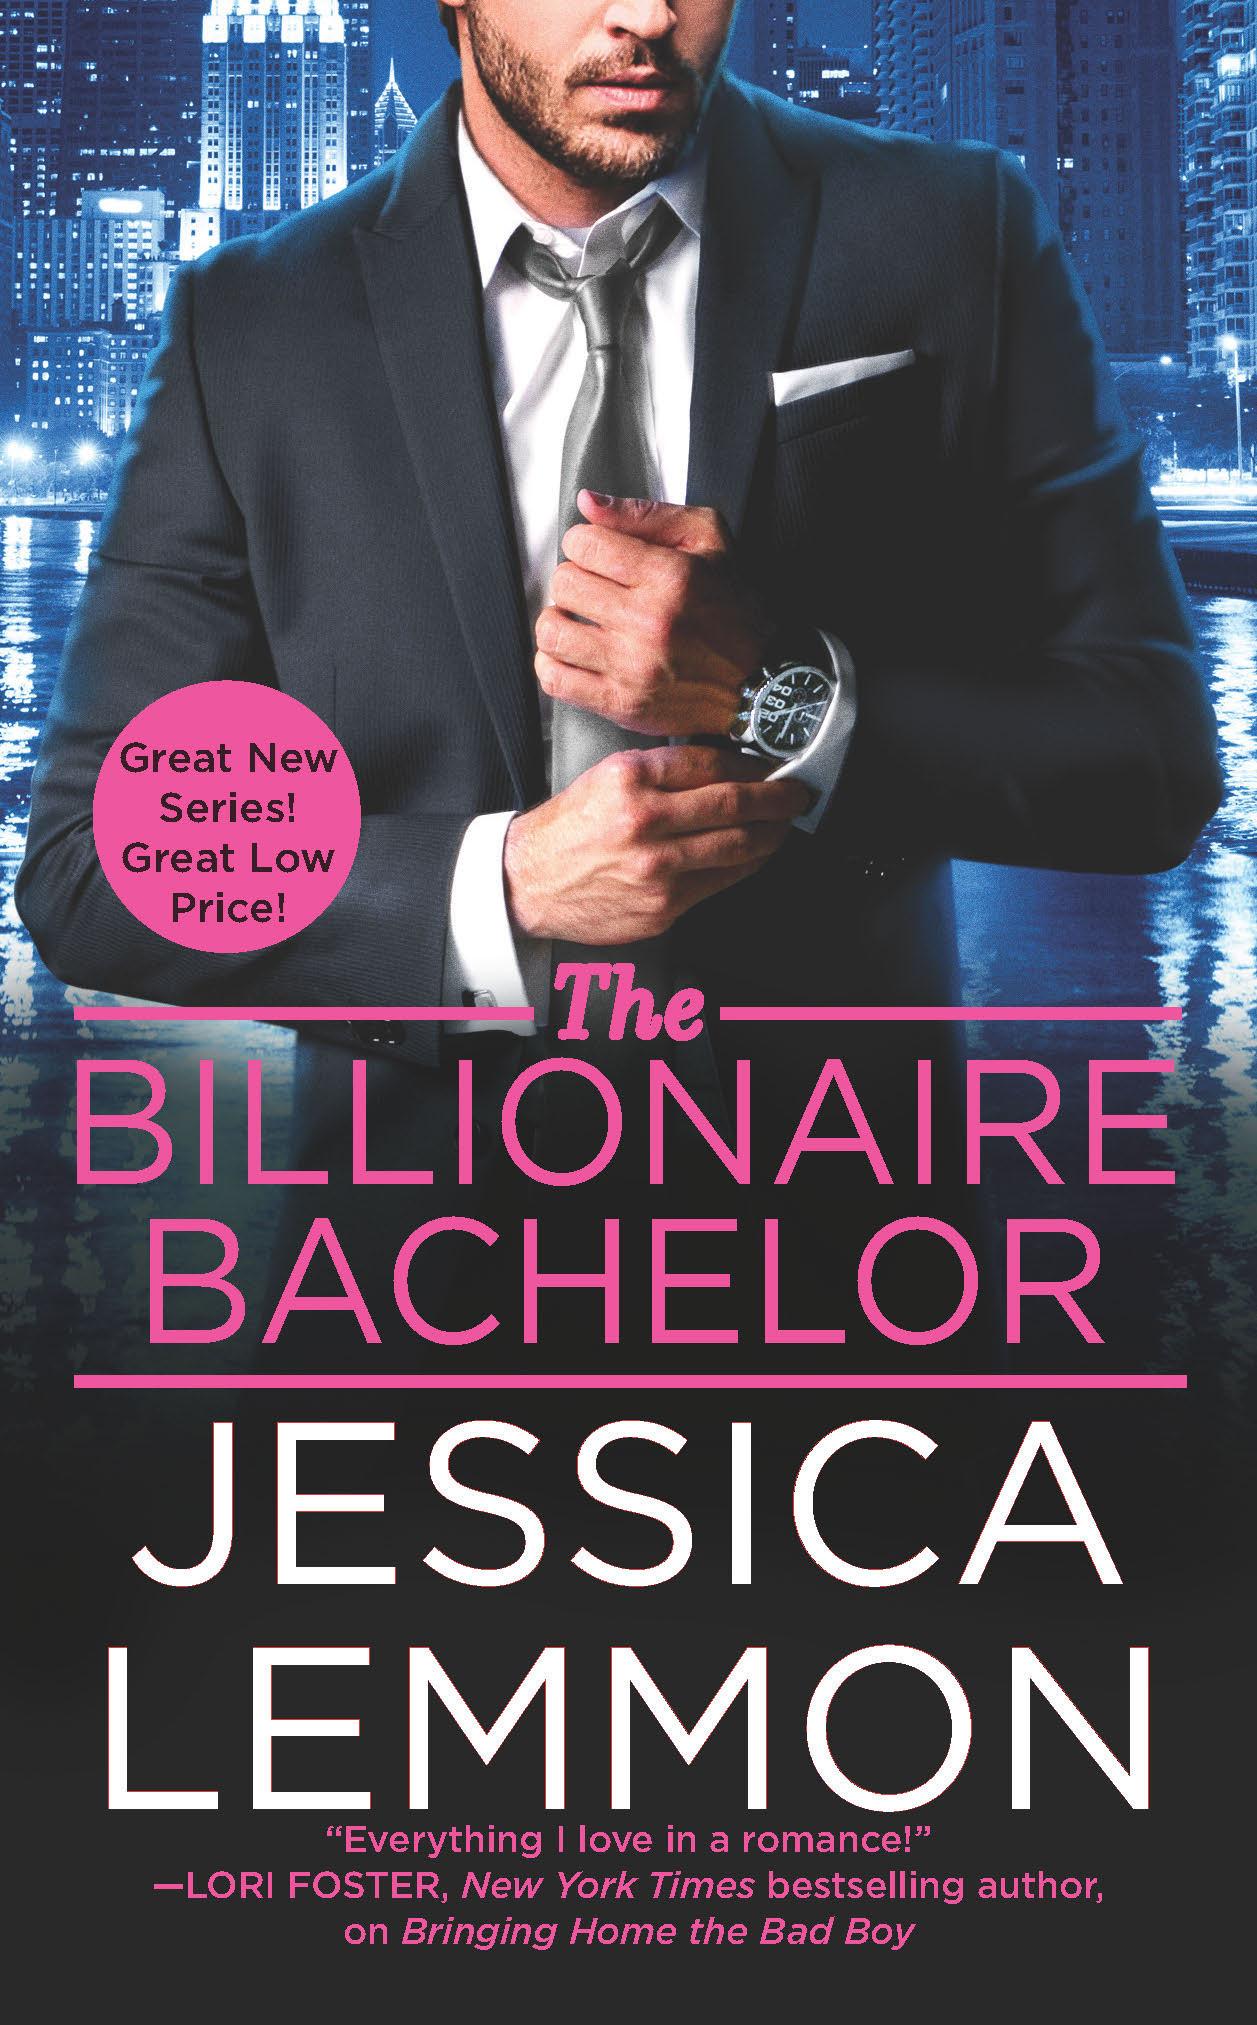 Blog Tour & Giveaway: The Billionaire Bachelor by Jessica Lemmon